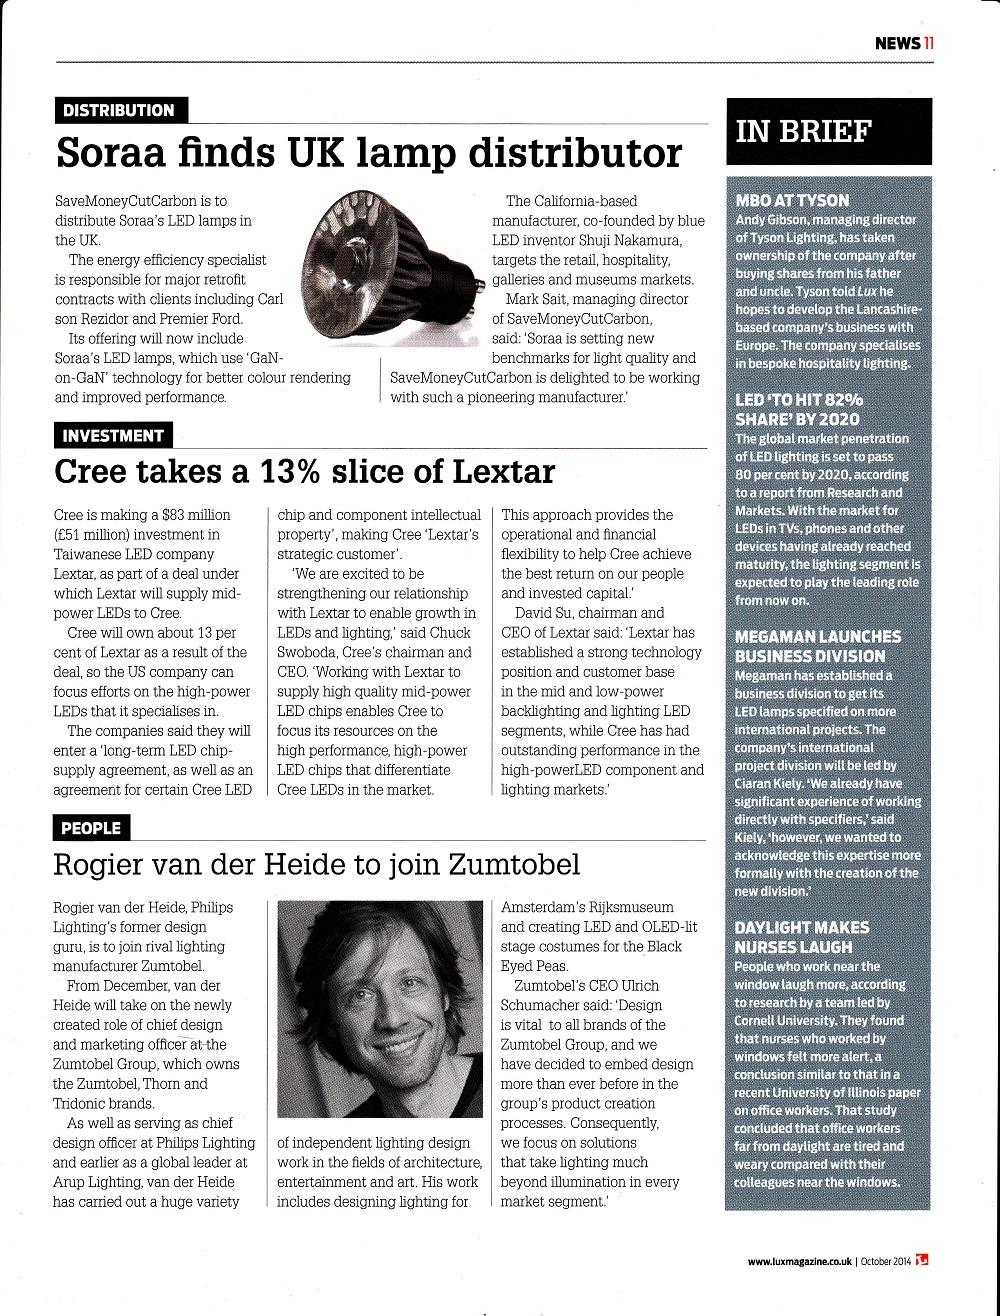 Lux magazine Soraa partnership with SaveMoneyCutCarbon.com story